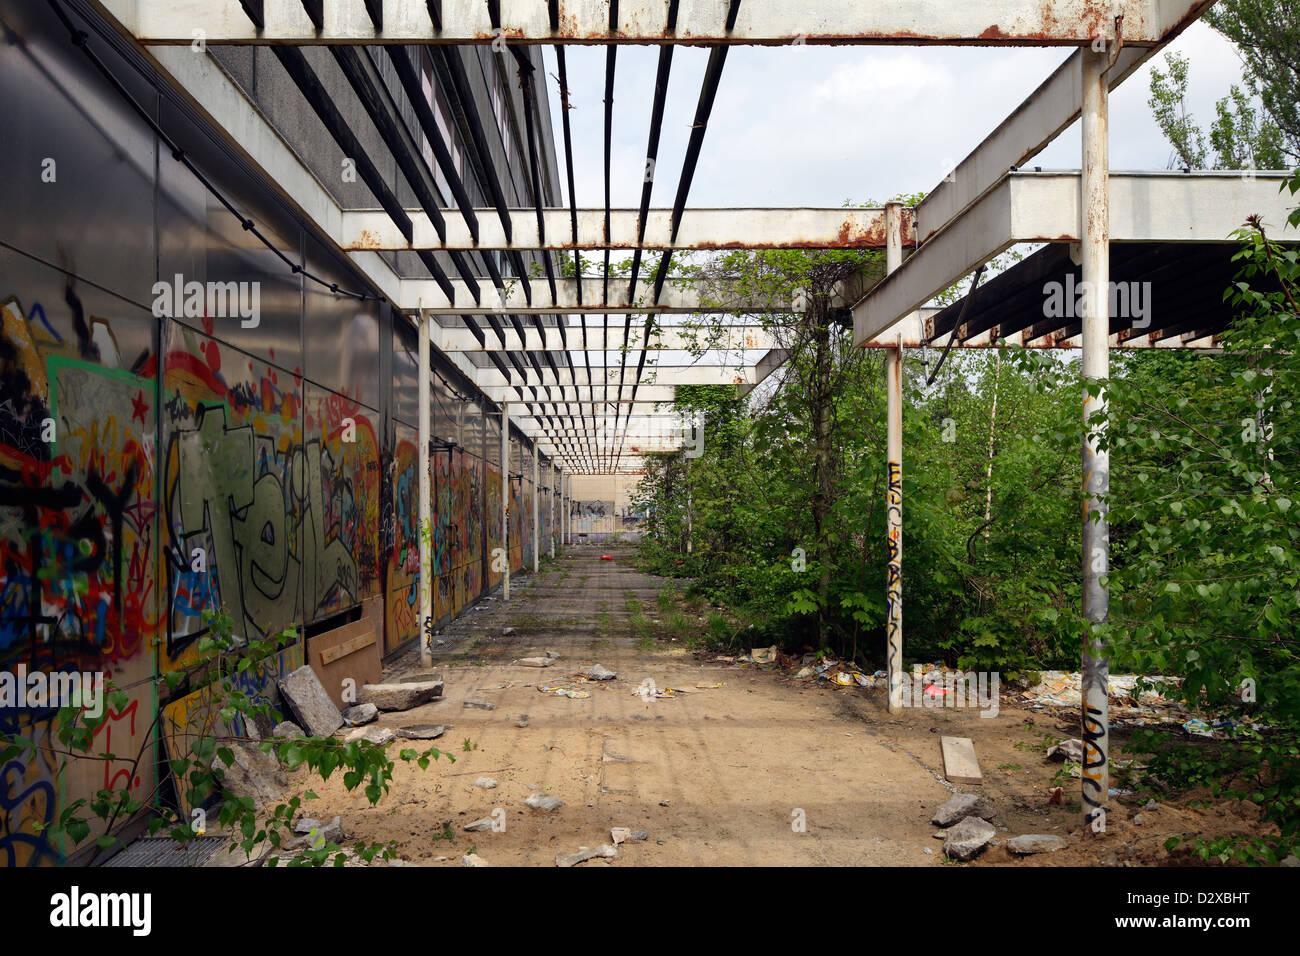 Berlin Germany Pergola At The Ruins Of The East German